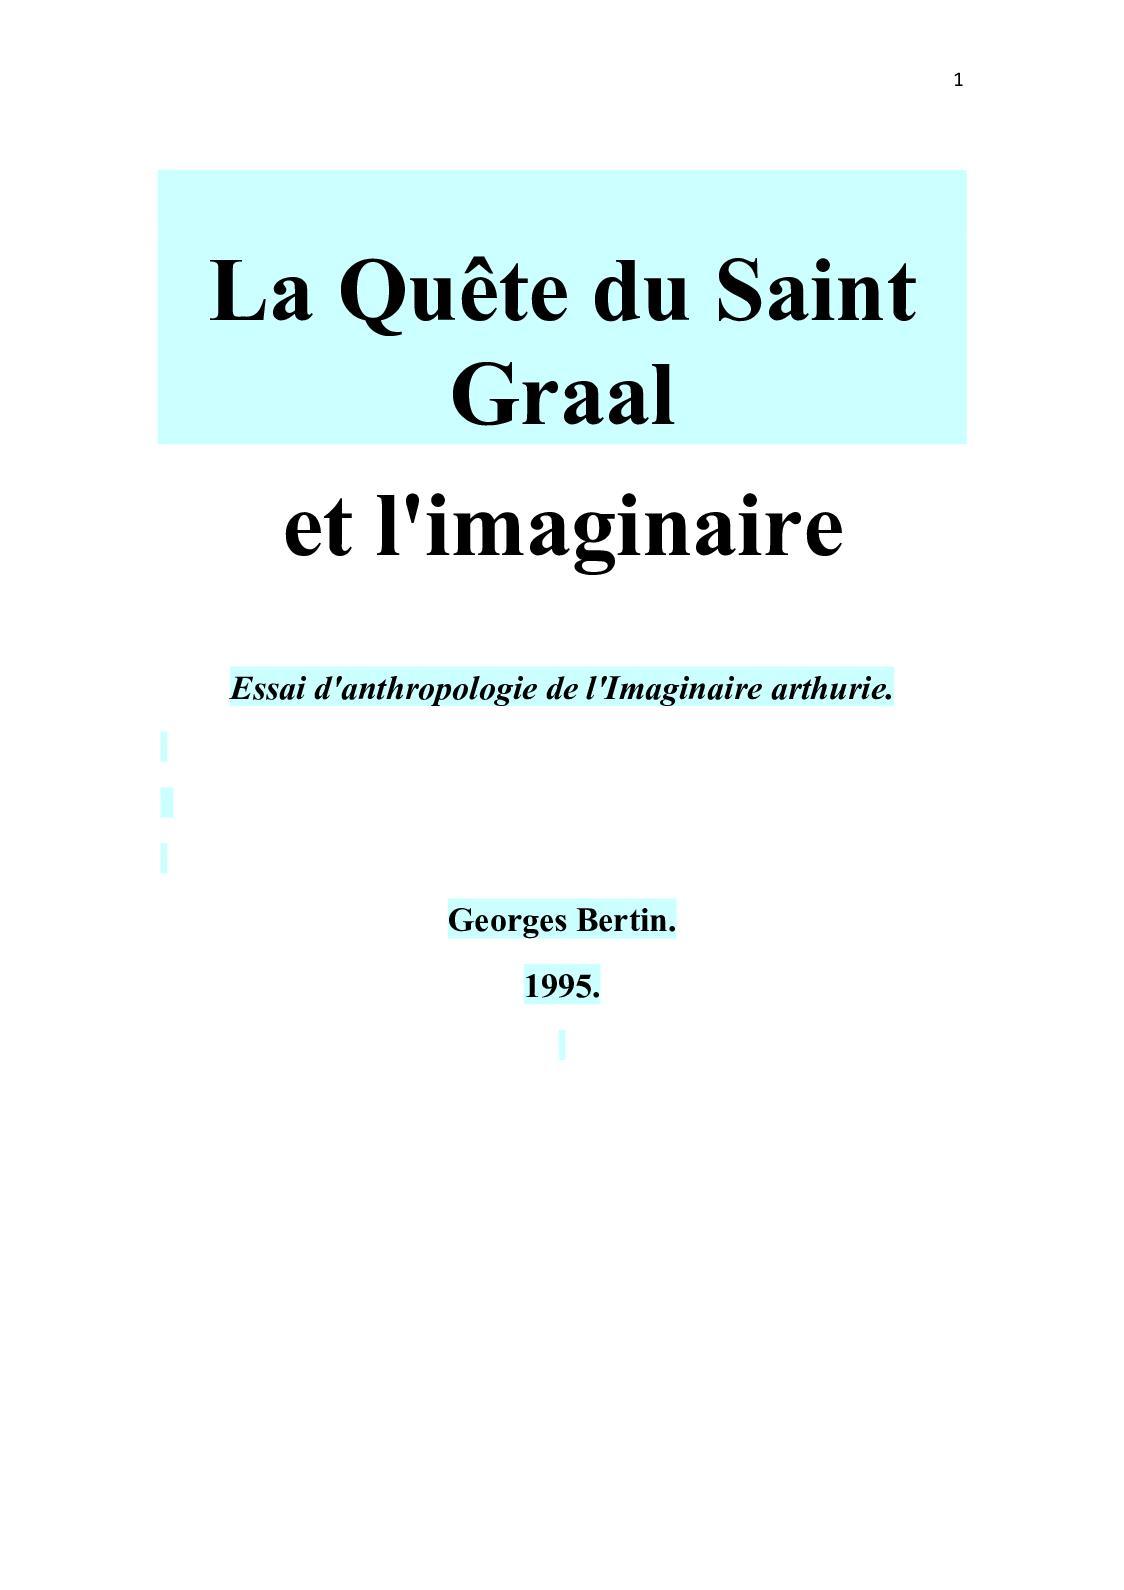 Calameo 152151999 La Quete Du Saint Graal Bertin Georges 1